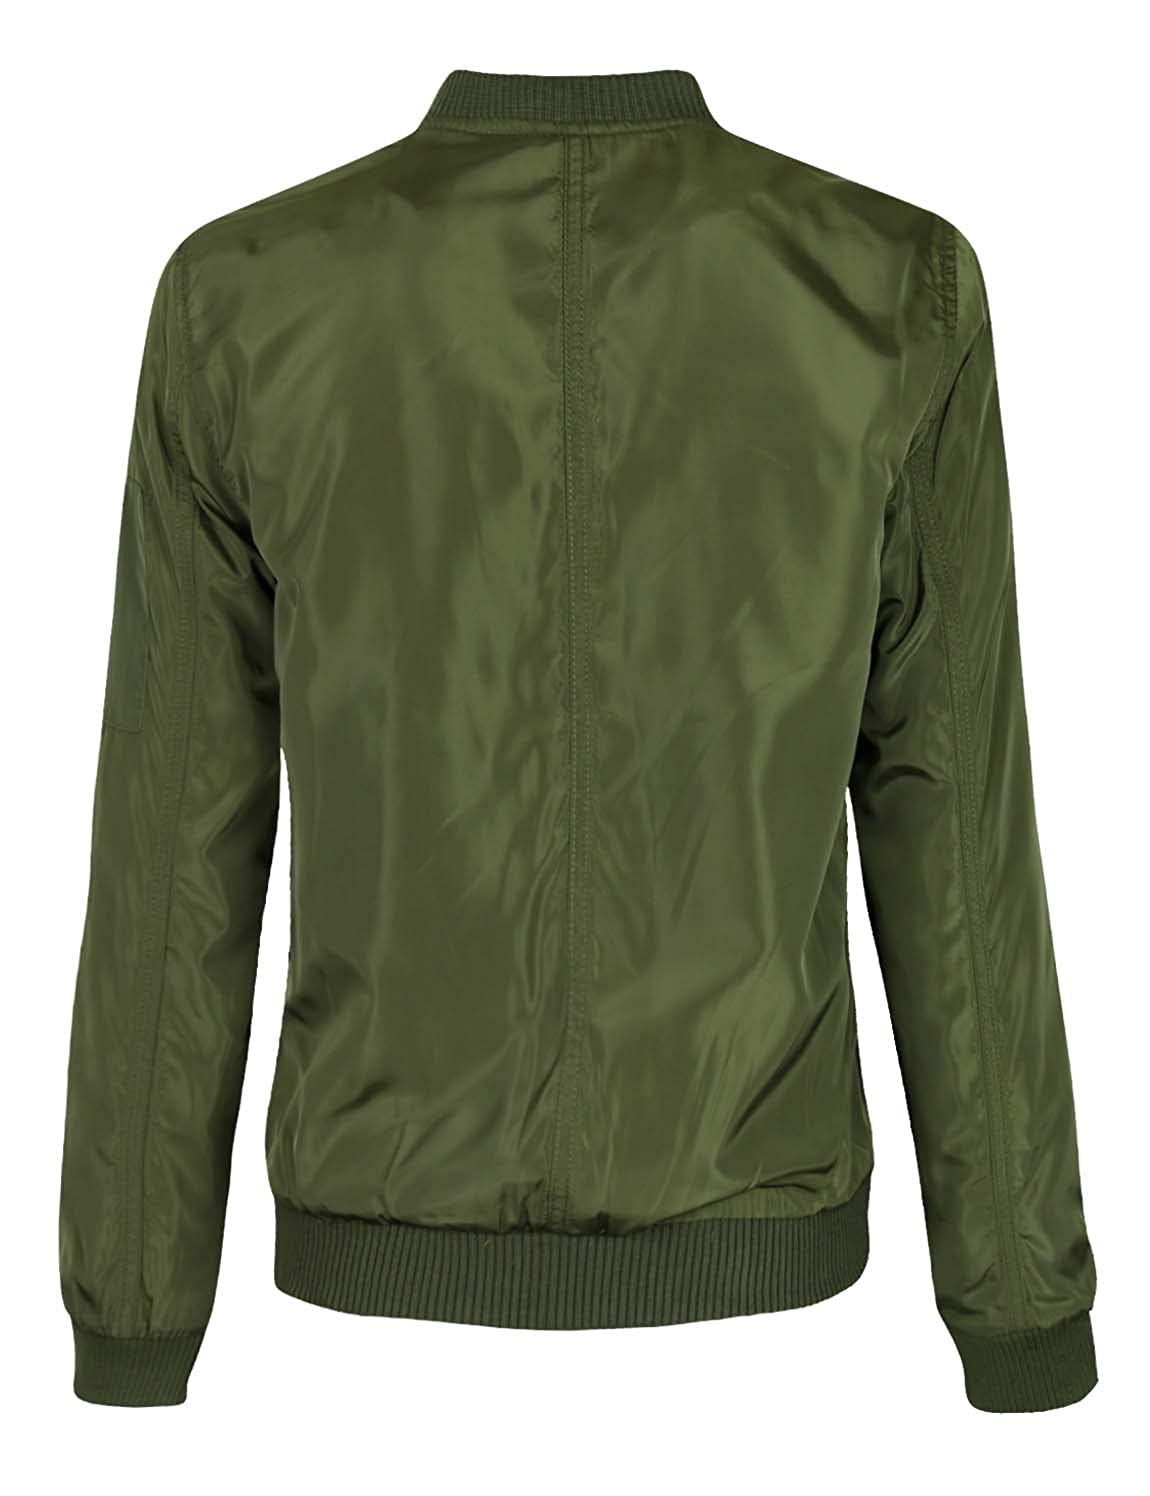 f4e947c90 makeitmint Women's Stylish Zip Up Patch Bomber Jacket w/Zipper Pocket  [S-3XL]